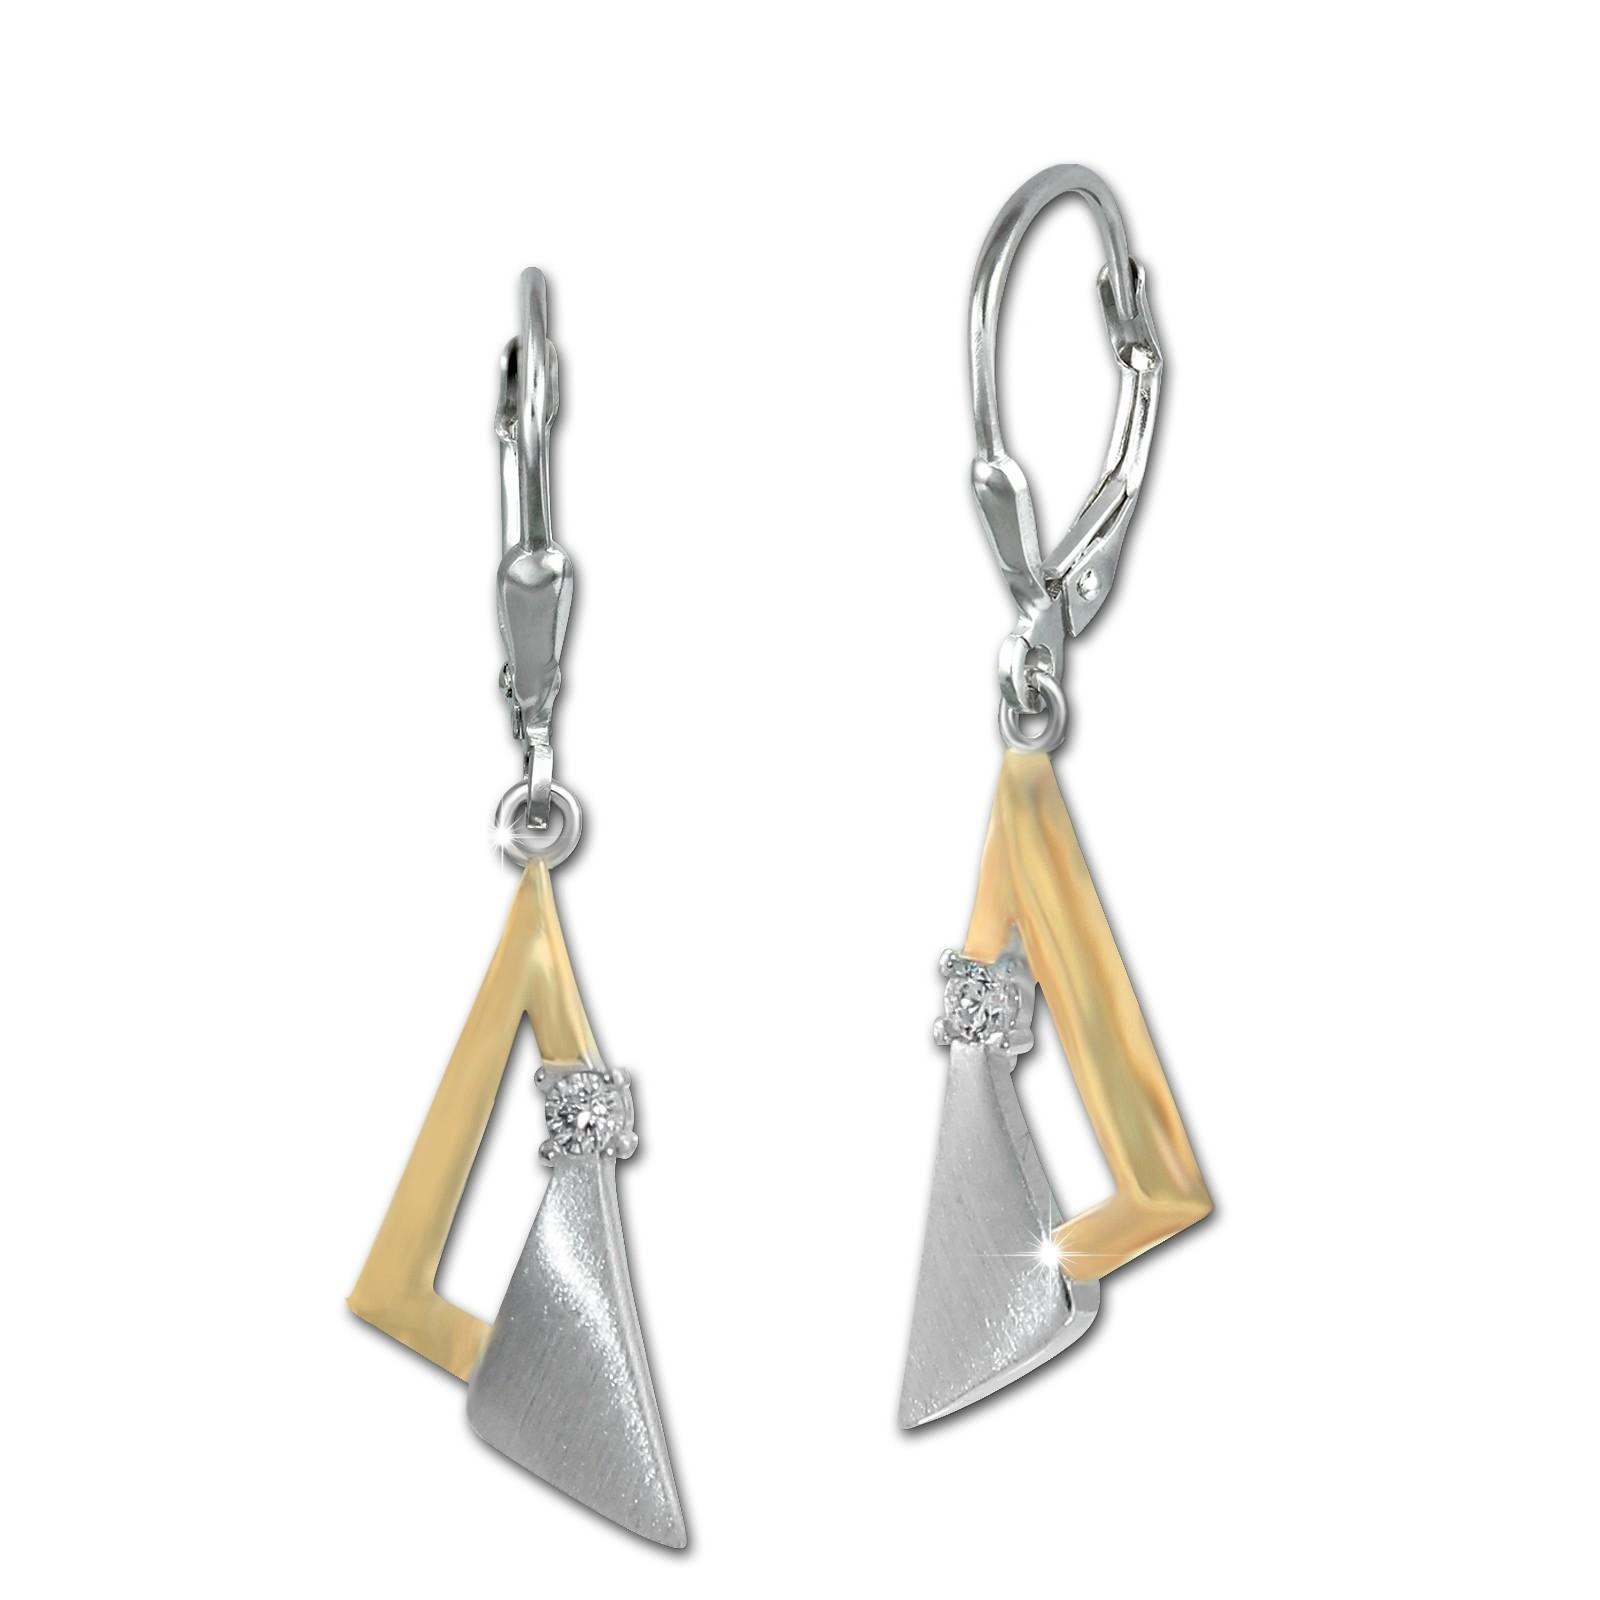 SilberDream Ohrhänger Triangles Zirkonia weiß 925 Sterling Silber Damen SDO4339T